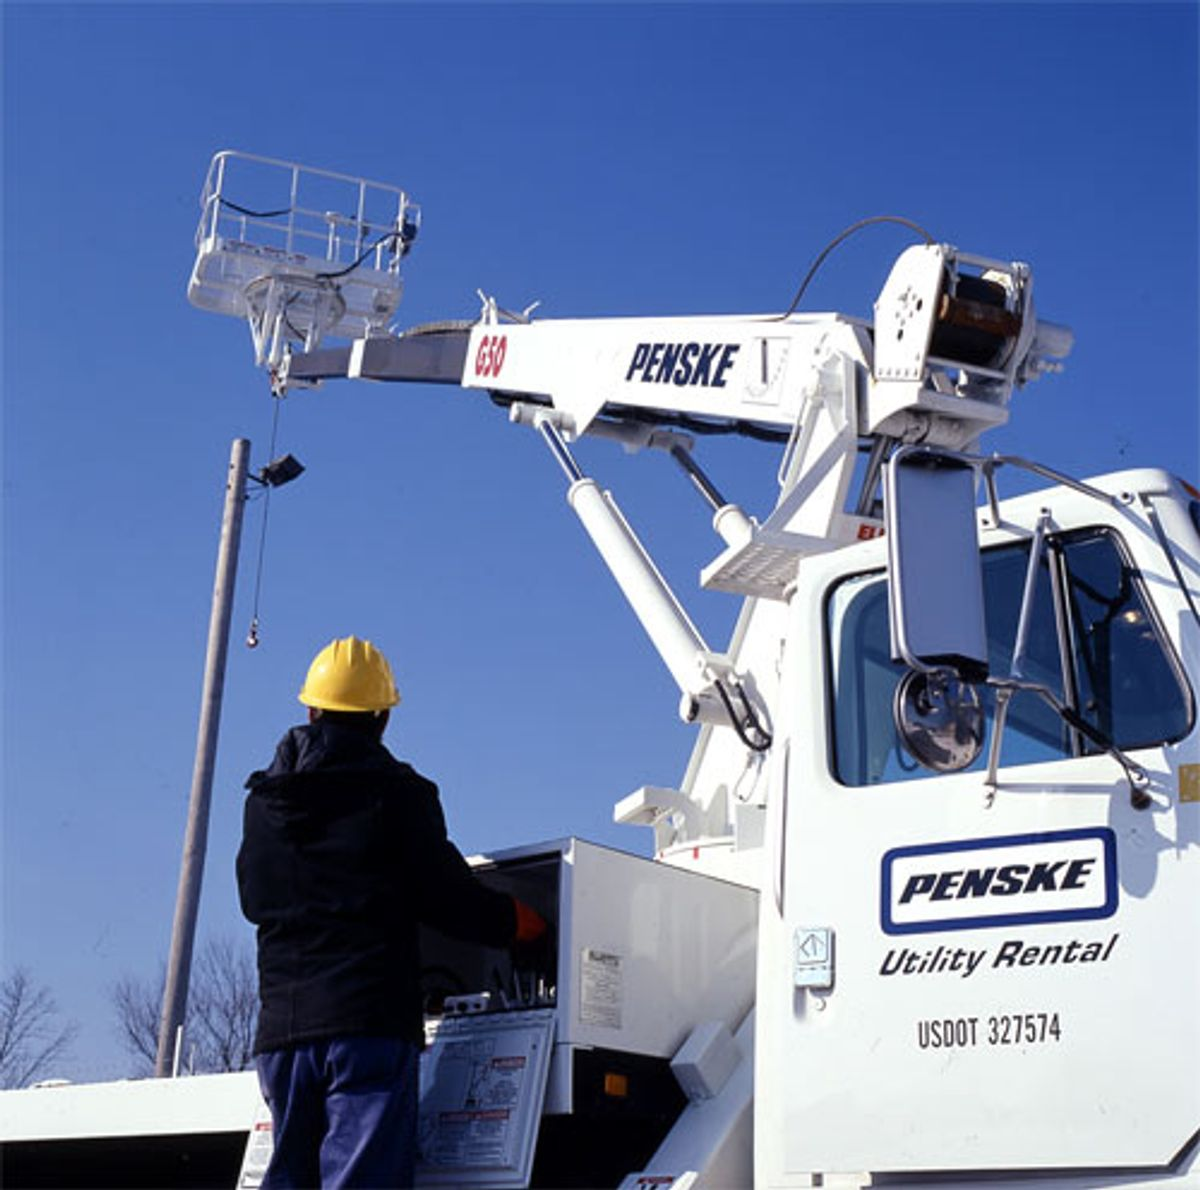 Utility Companies Depend on Penske for Fleet Reliability